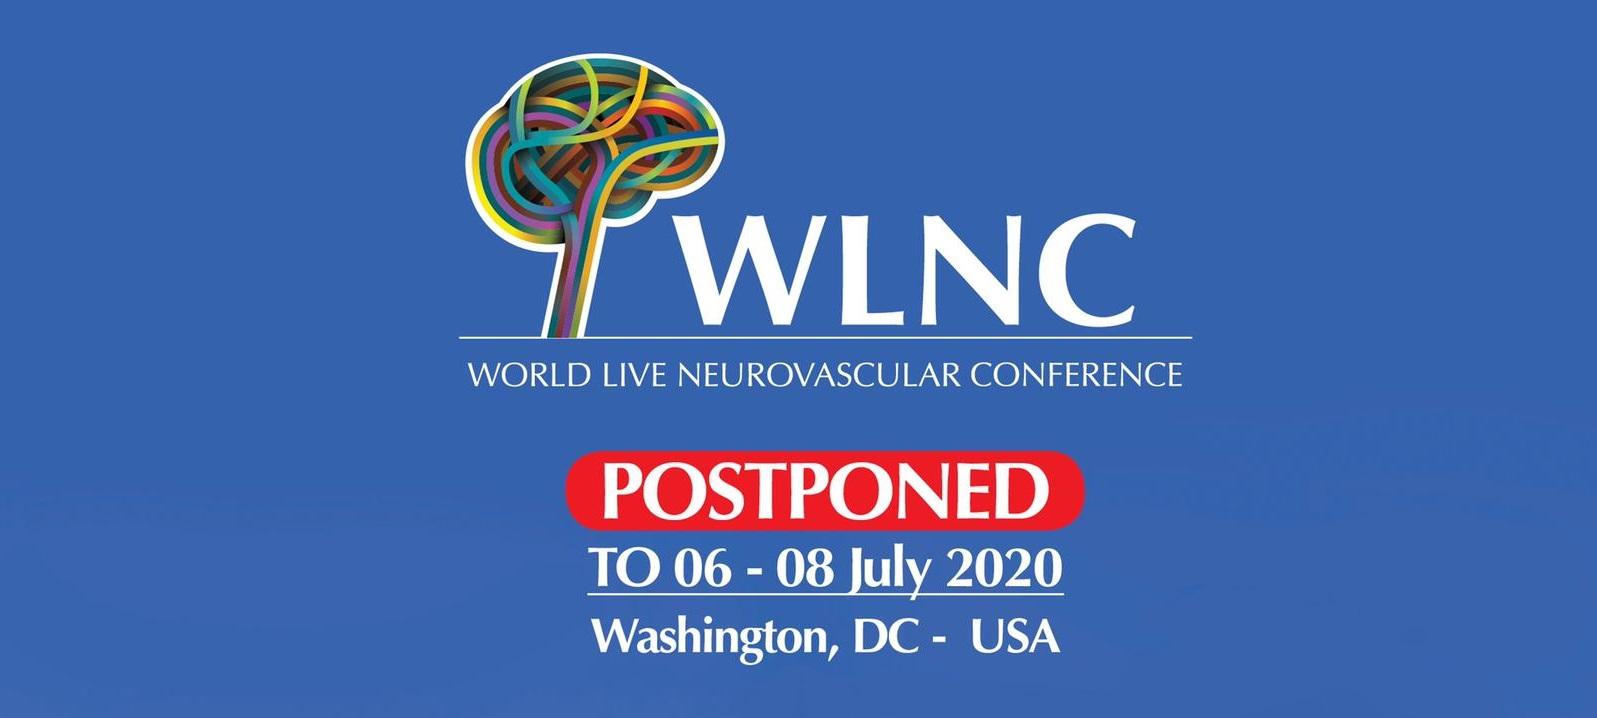 WLNC 2020